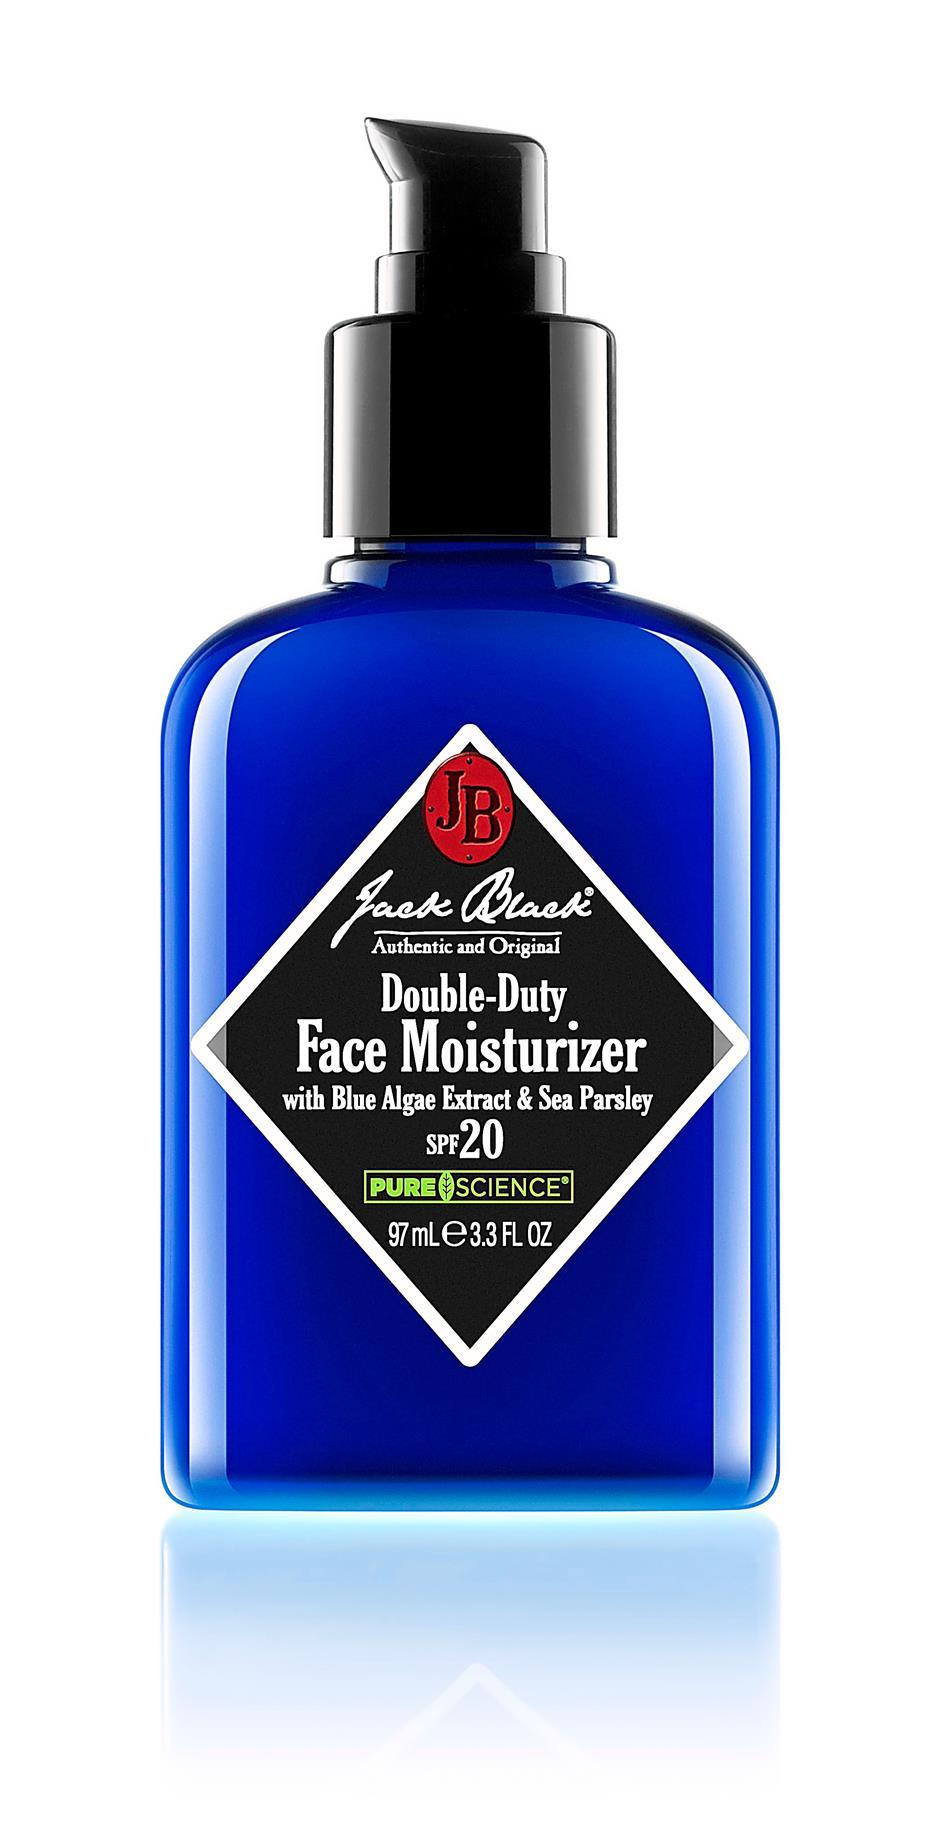 Jack Black Double-duty Face Moisturiser SPF 20.